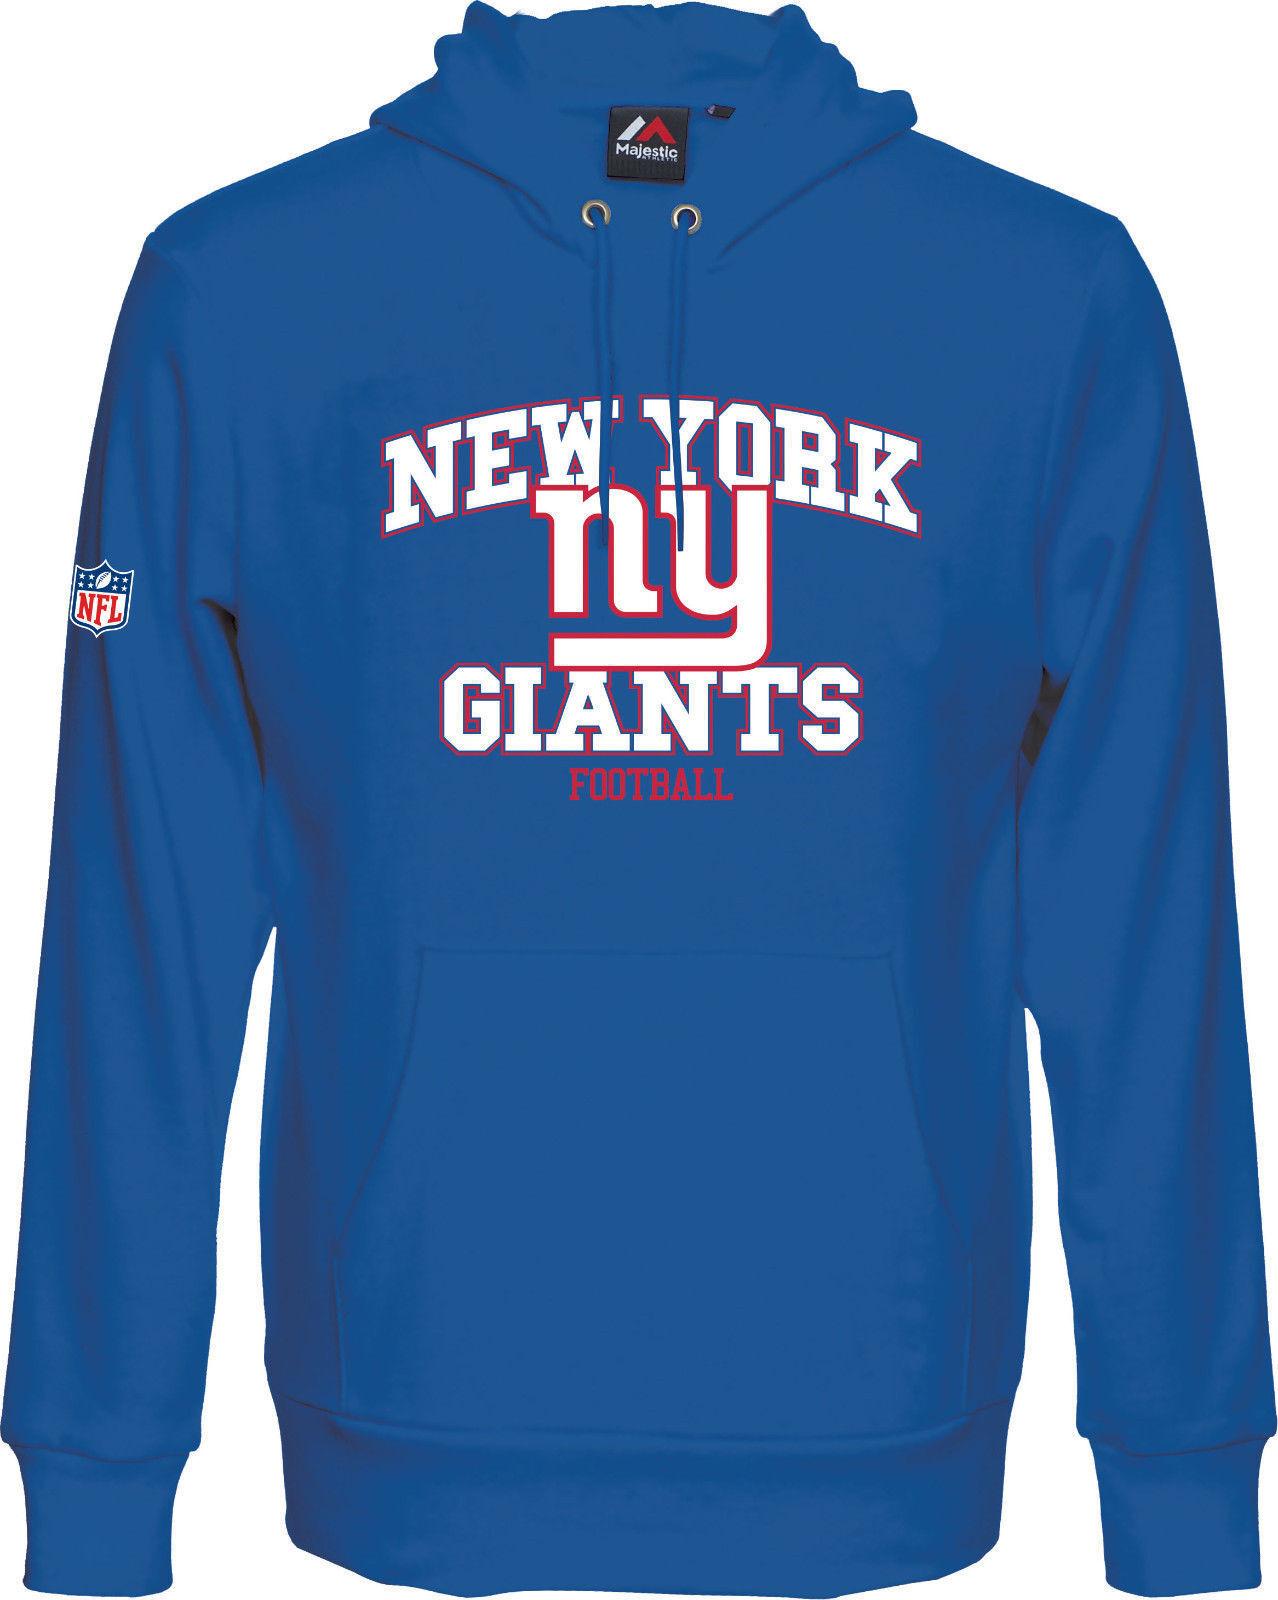 NFL FOOTBALL NEW YORK NY Giants Hoody kaputzenpullover Greatness Hooded Sweater